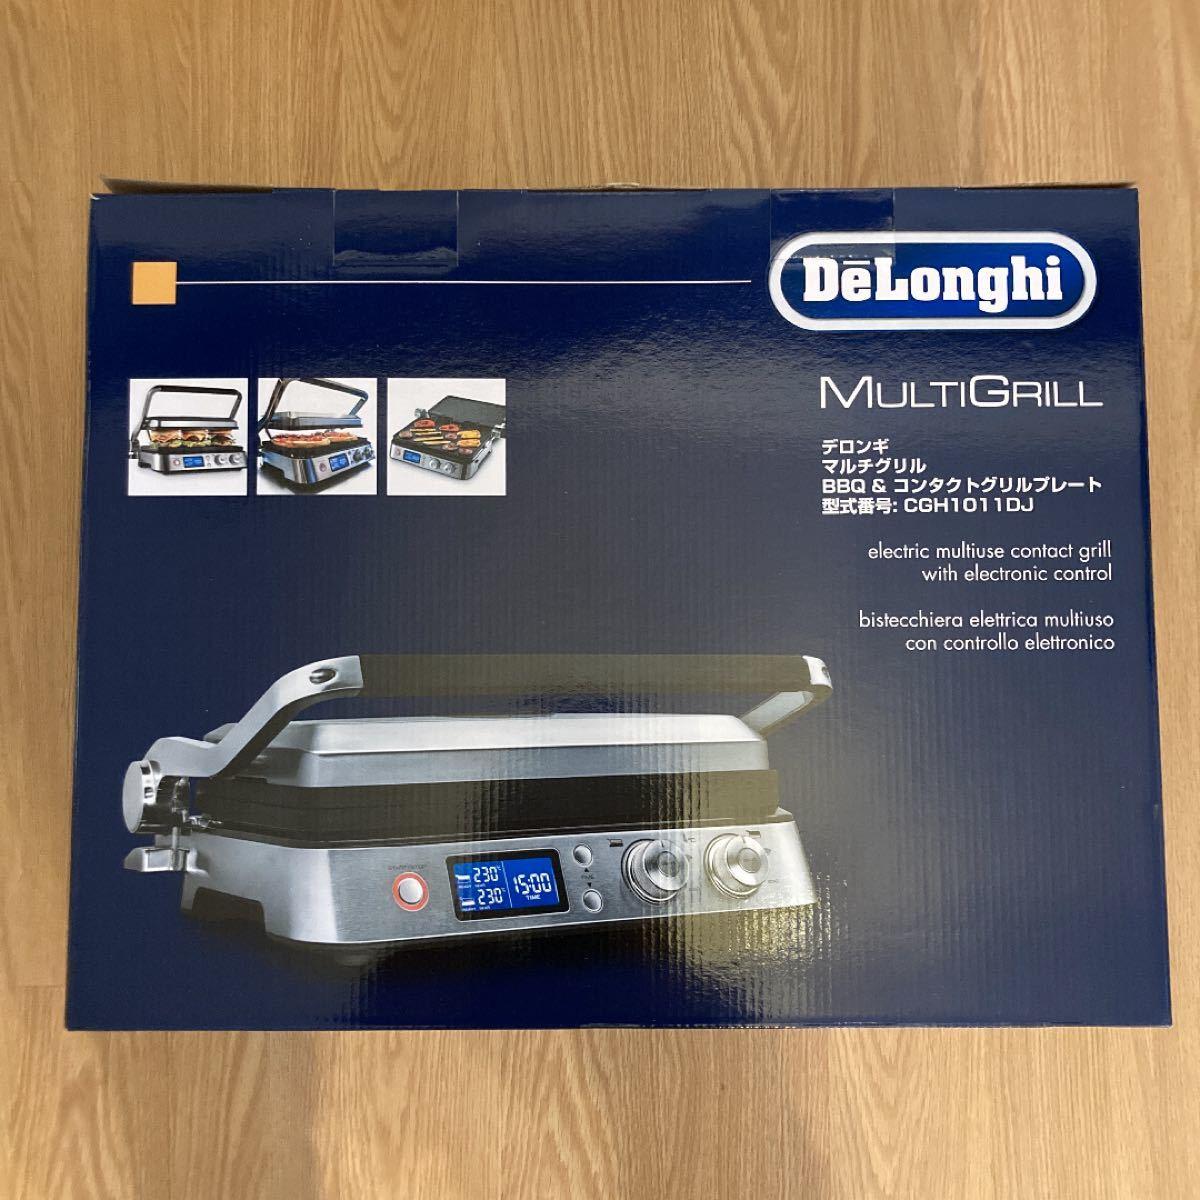 DeLonghi マルチグリル CGH1011DJ